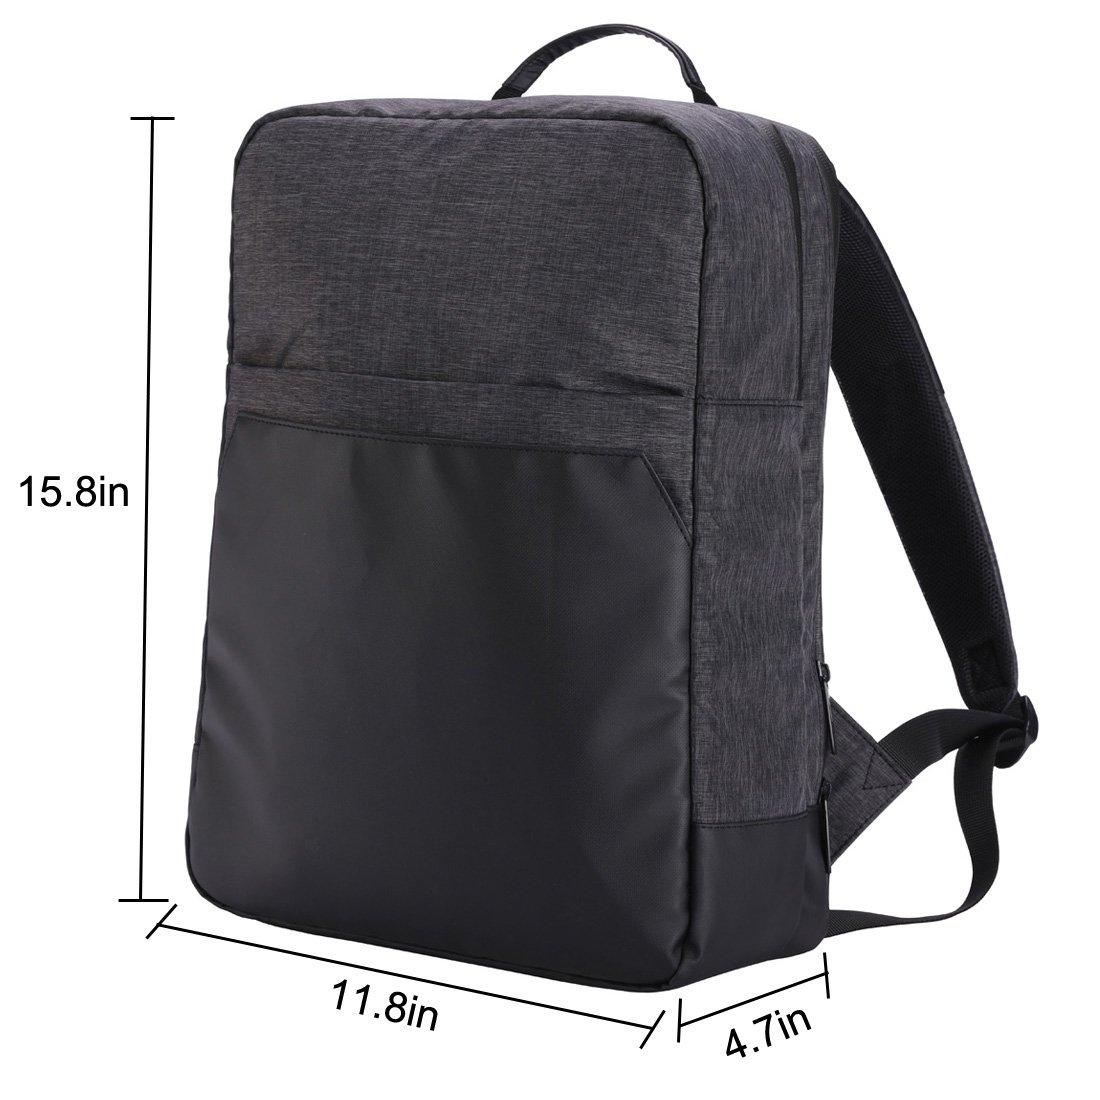 9043ba2f29e3 Amazon.com: Leberna Lightweight Business Backpack Water-resistant ...